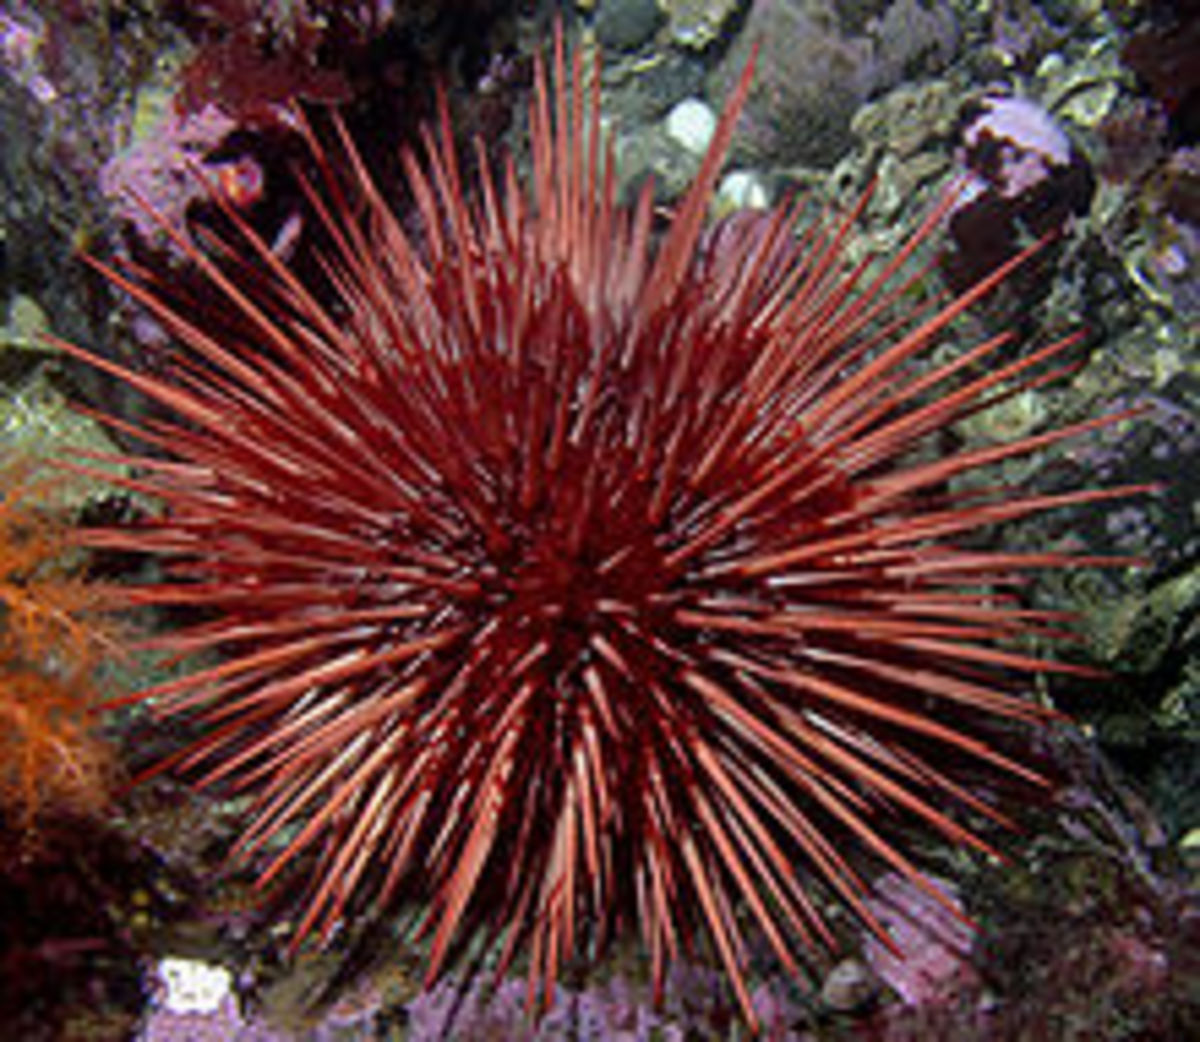 Strongylocentrotus franciscanus